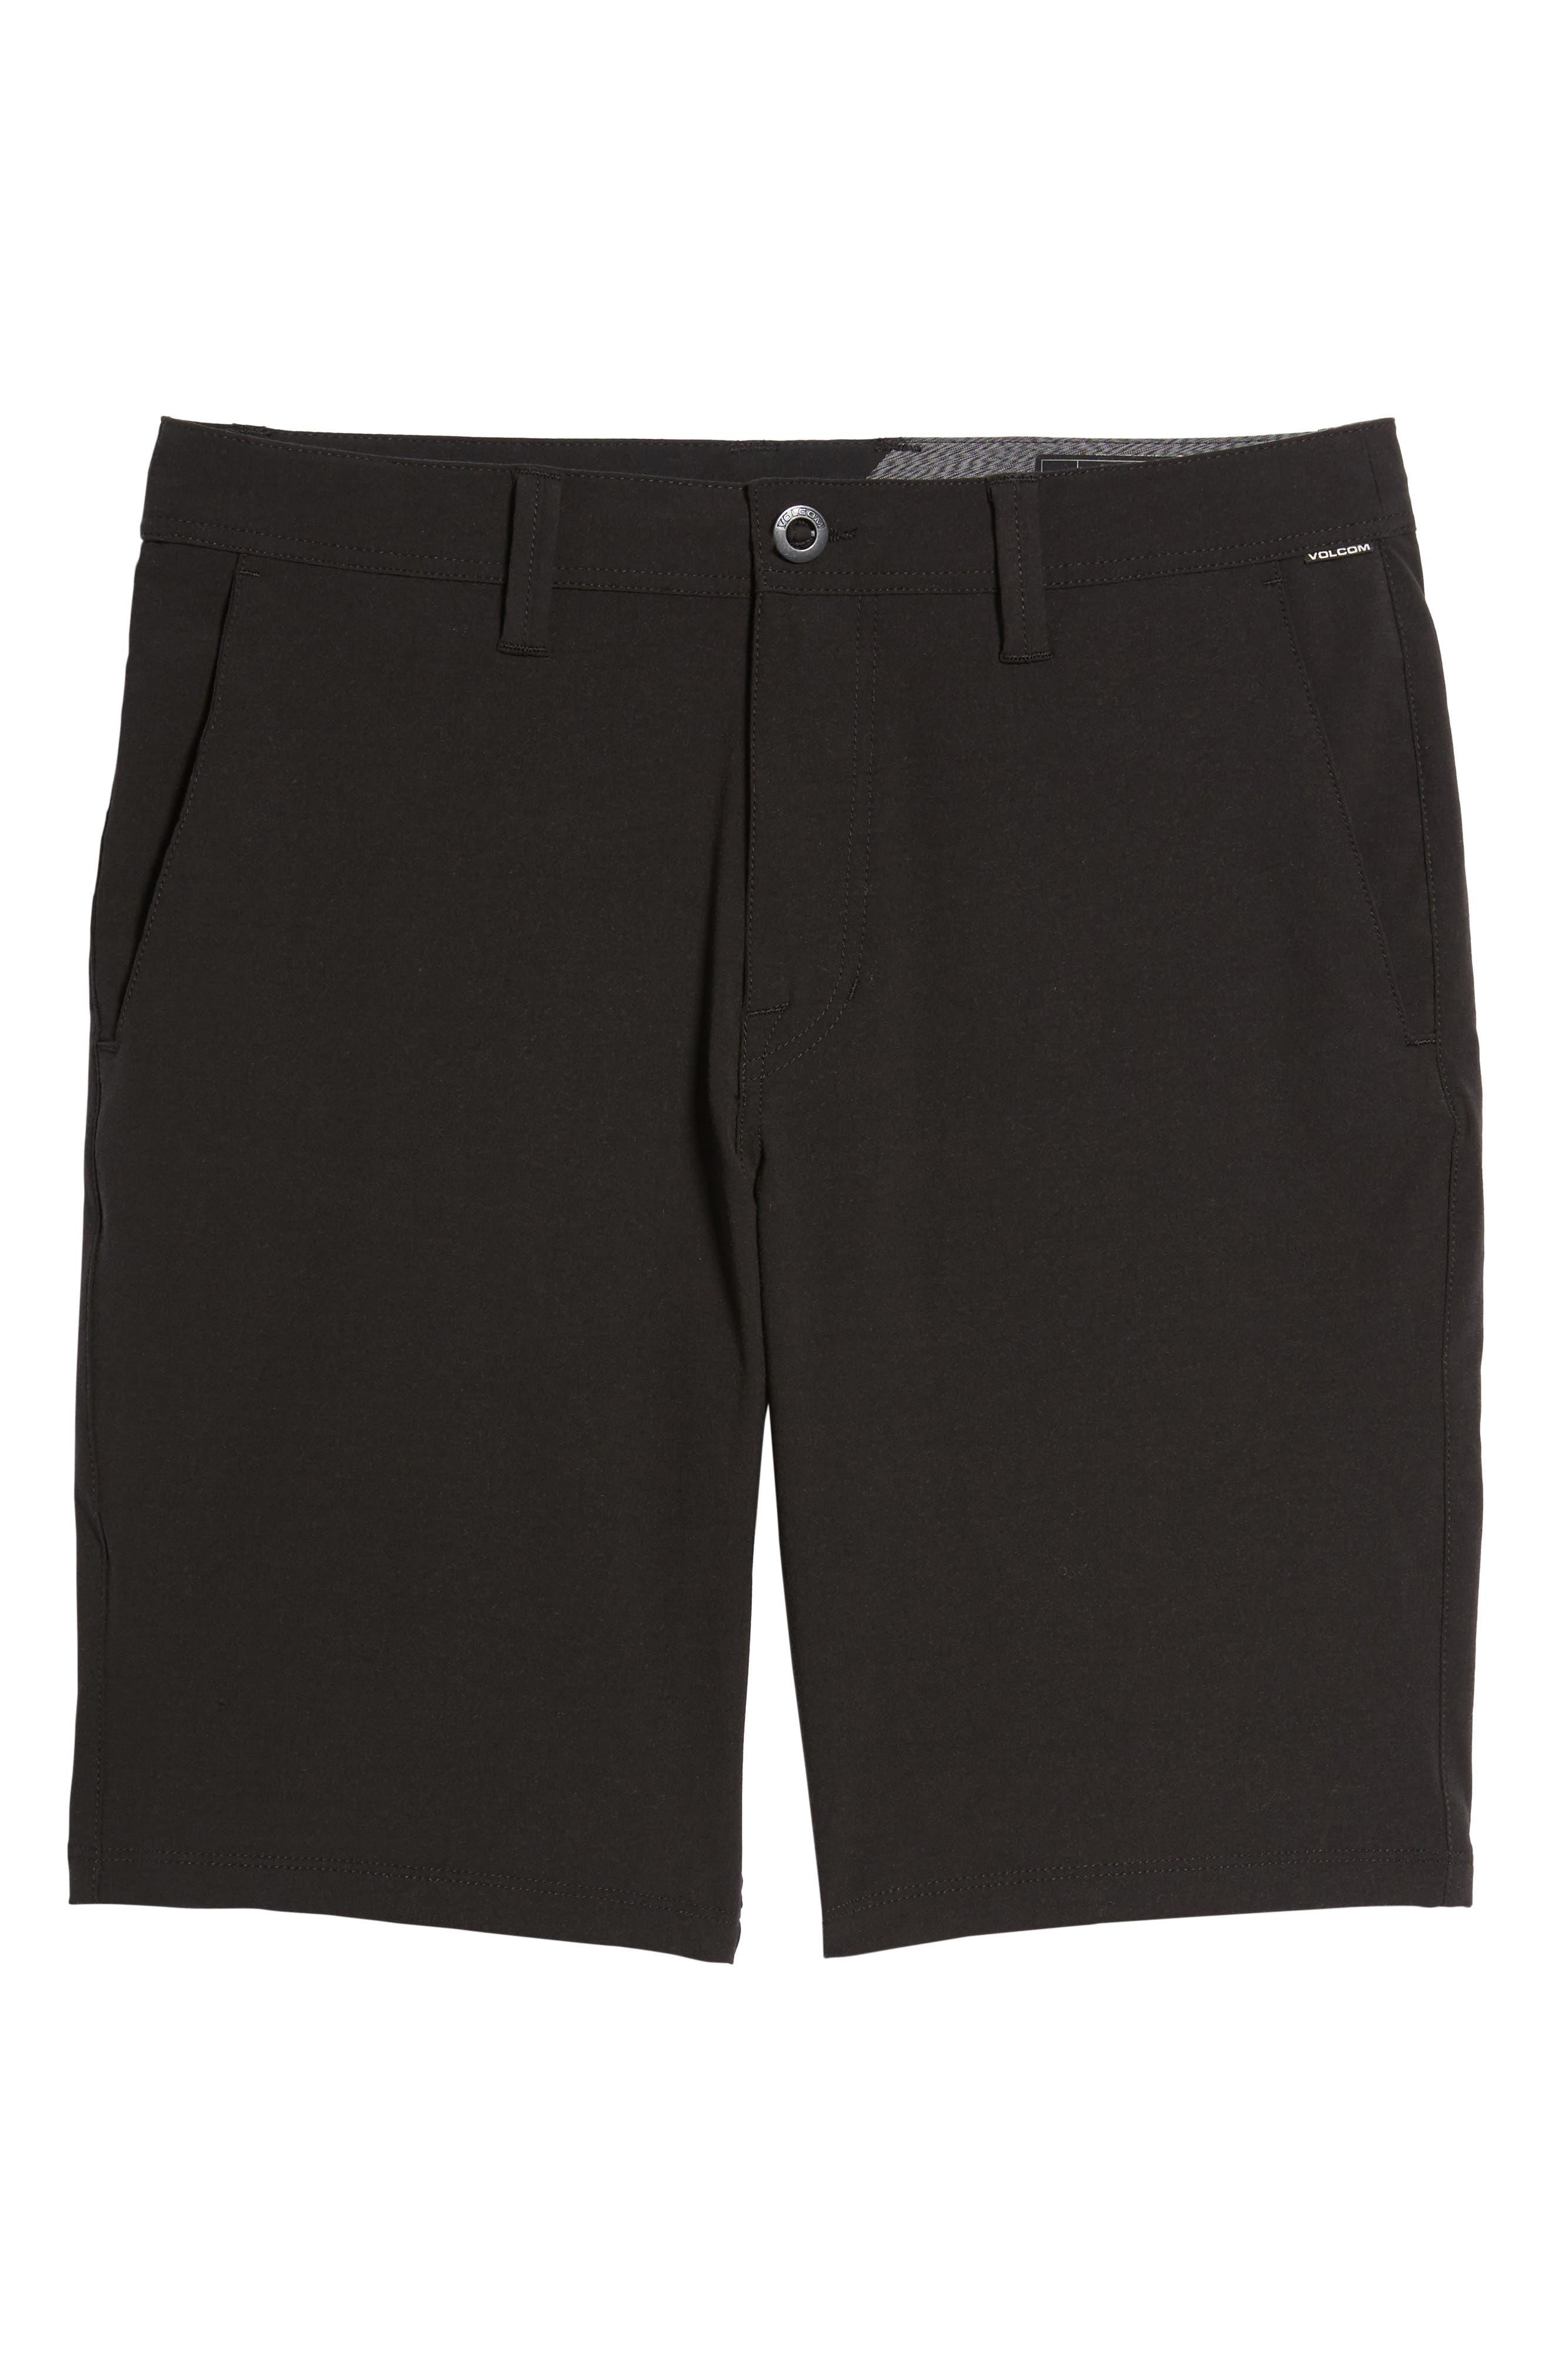 Hybrid Shorts,                             Alternate thumbnail 6, color,                             BLACK